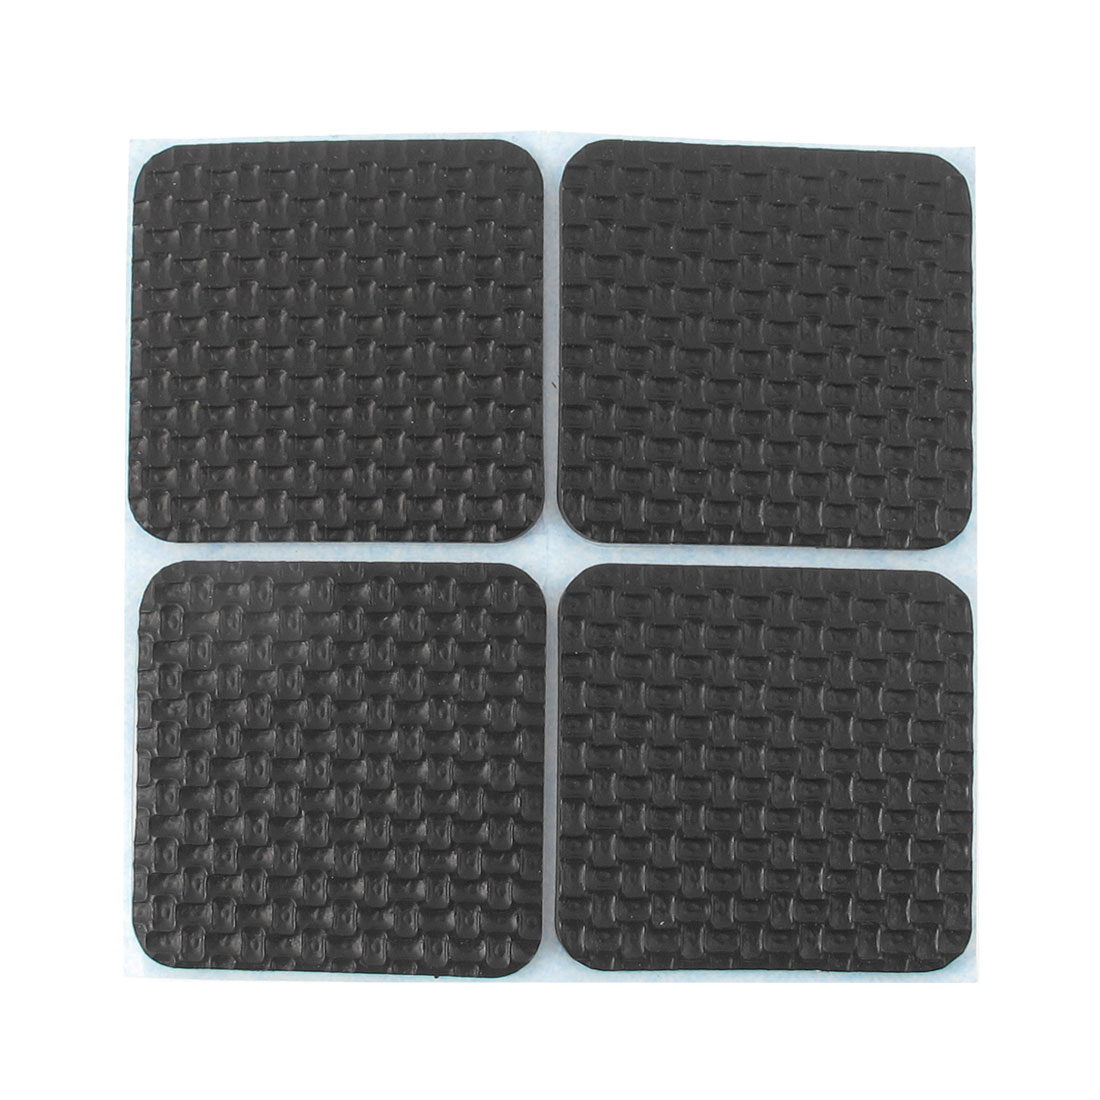 Unique Bargains 4 Pcs Antislip Foam Square 42mm x 42mm Adhesive Chair Foot Cover Table Furniture Leg Protector Black